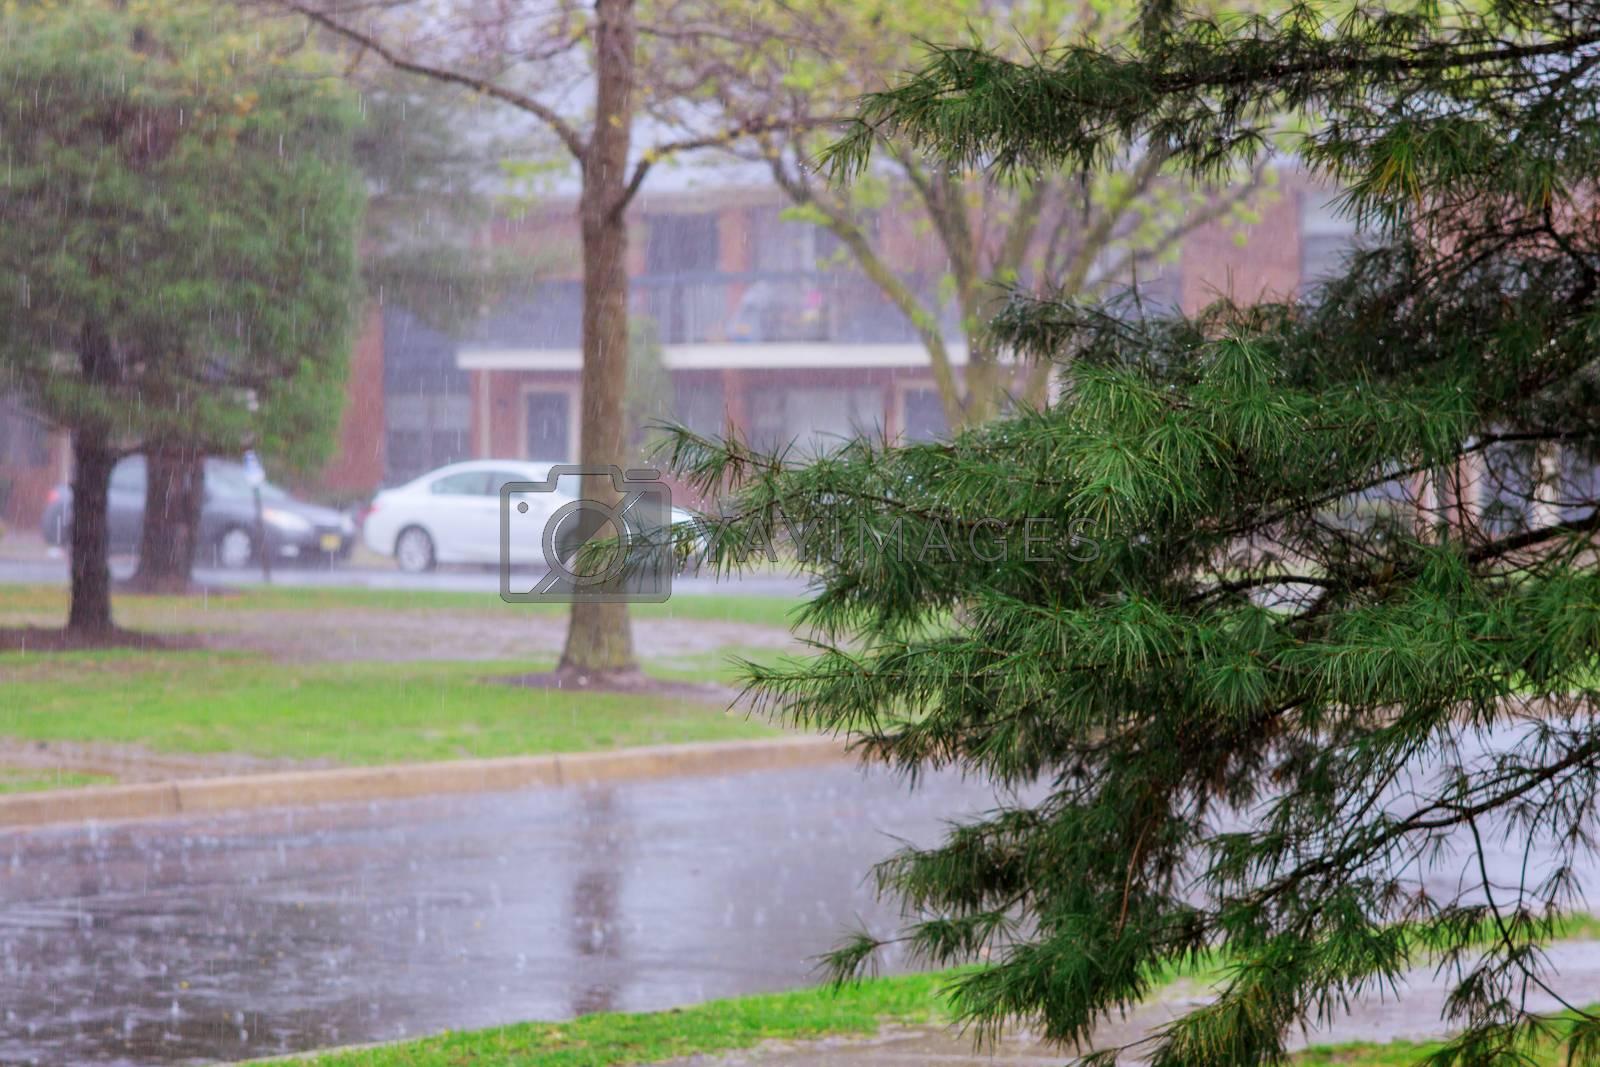 Rainwater dripping the rainy season apartment trees under during heavy rain